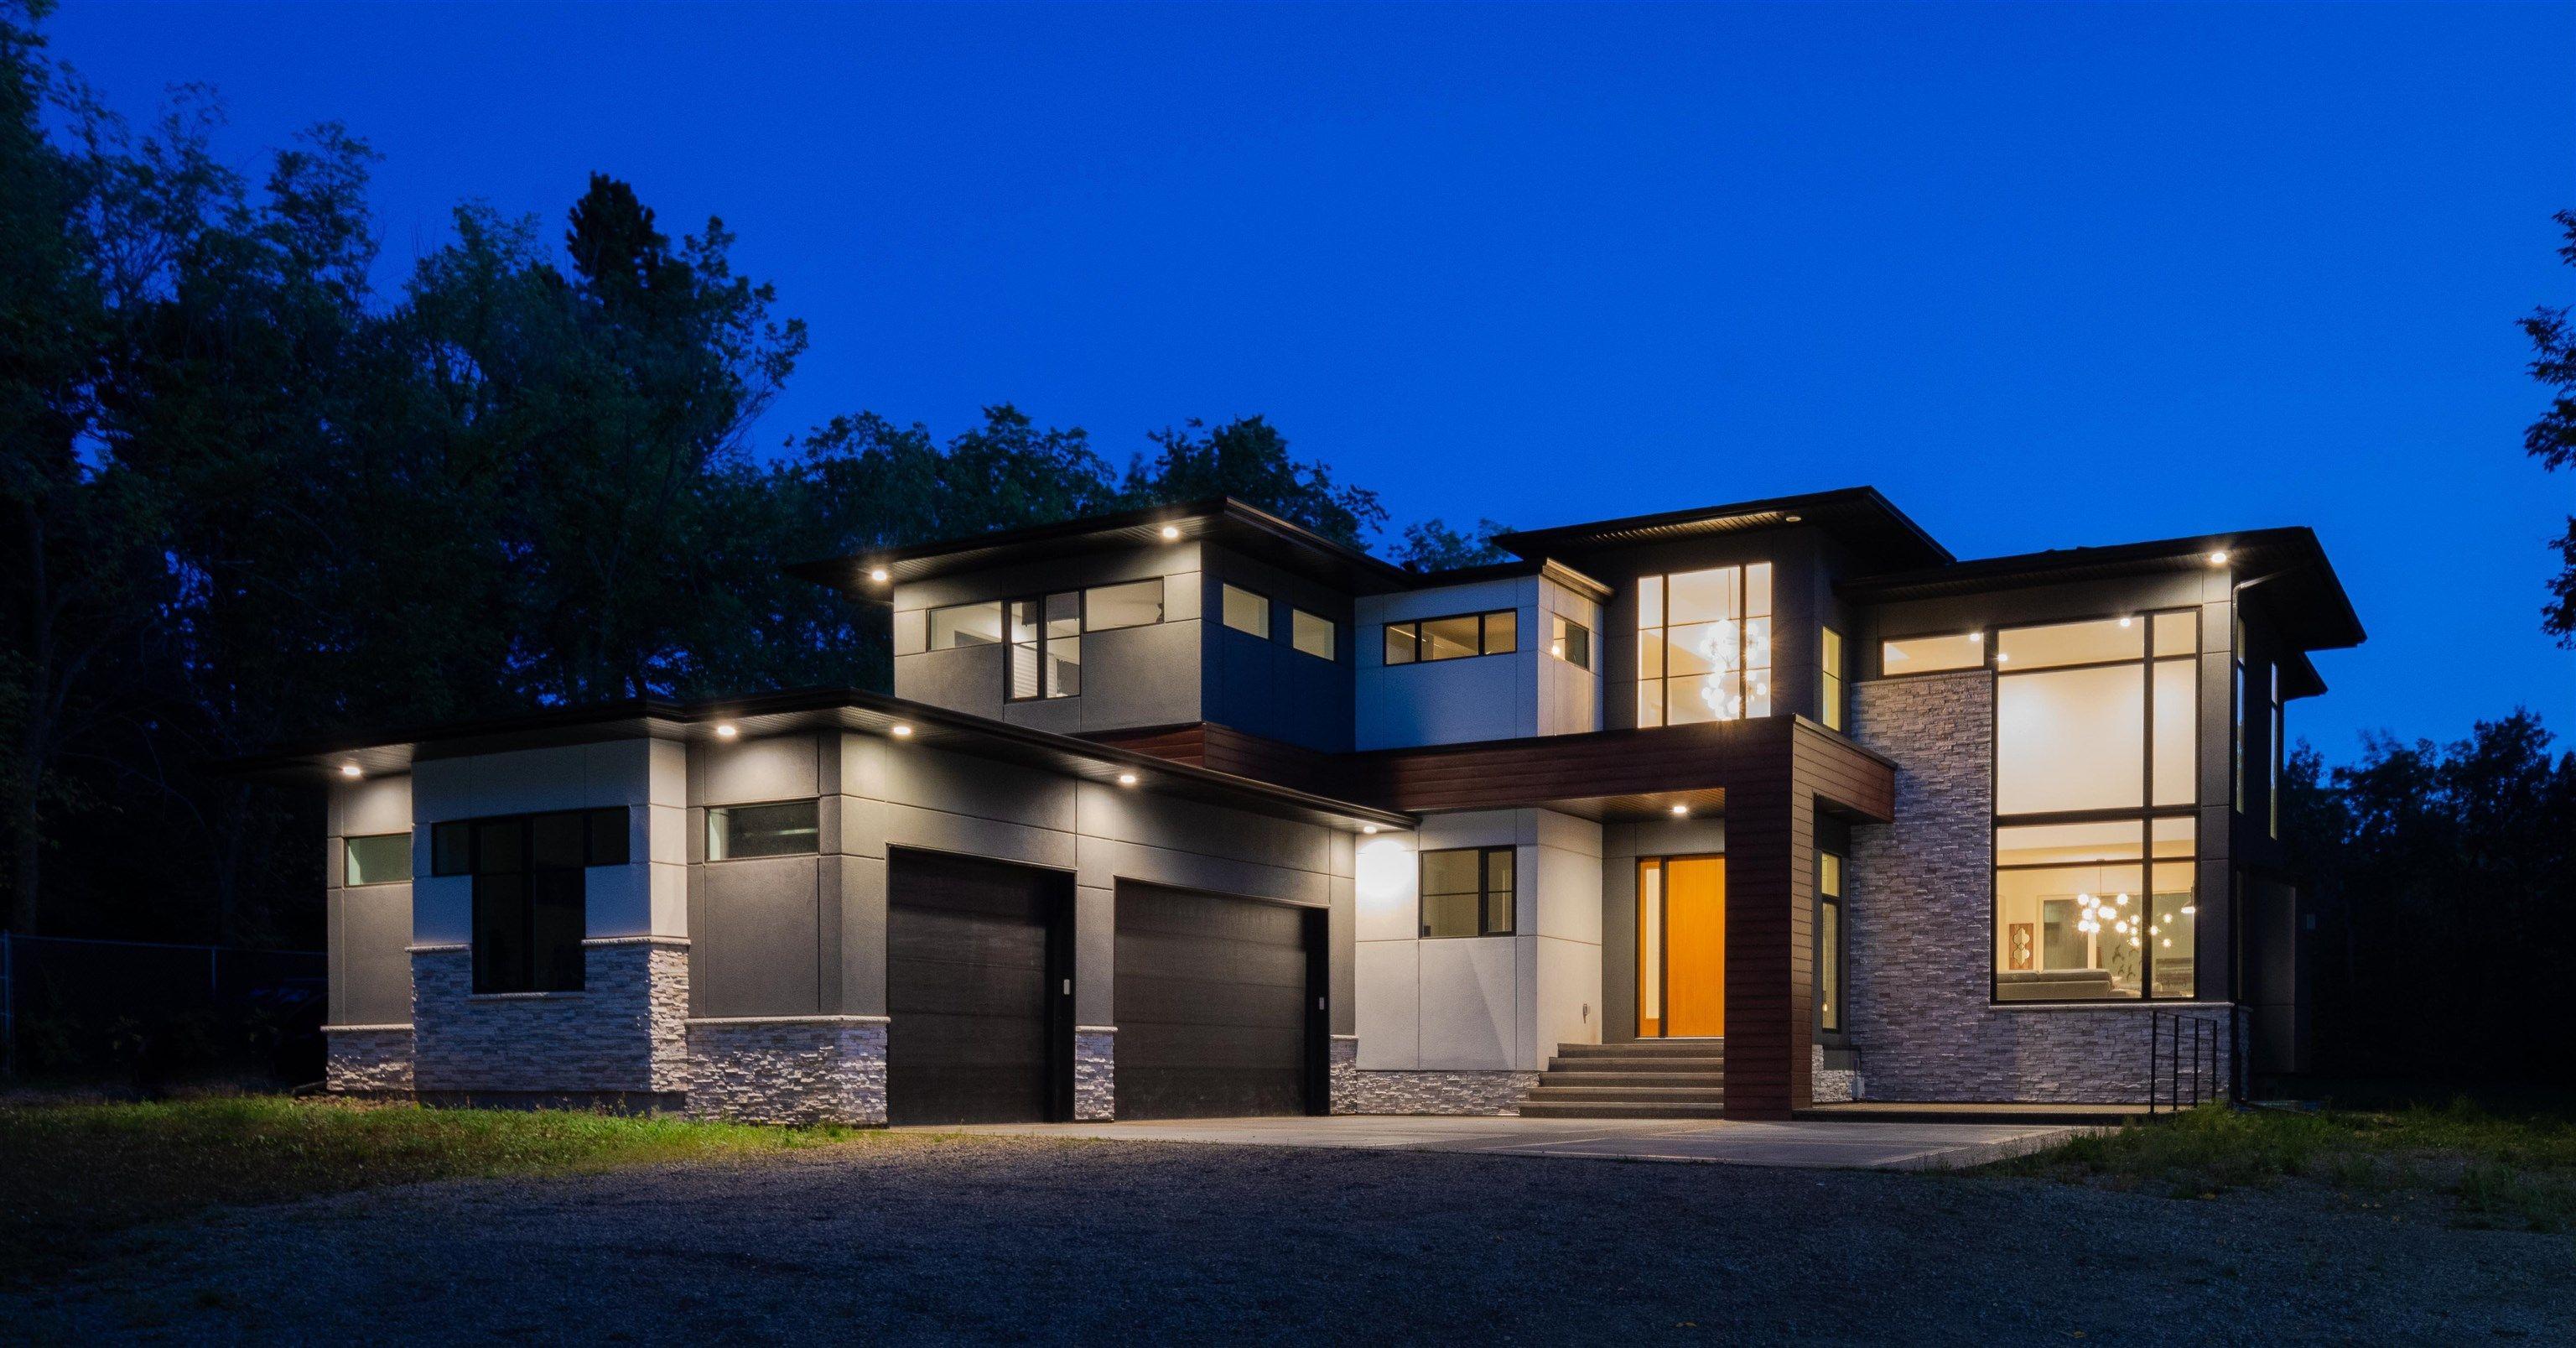 Main Photo: 6A CRESTVIEW Drive: Rural Sturgeon County House for sale : MLS®# E4263551